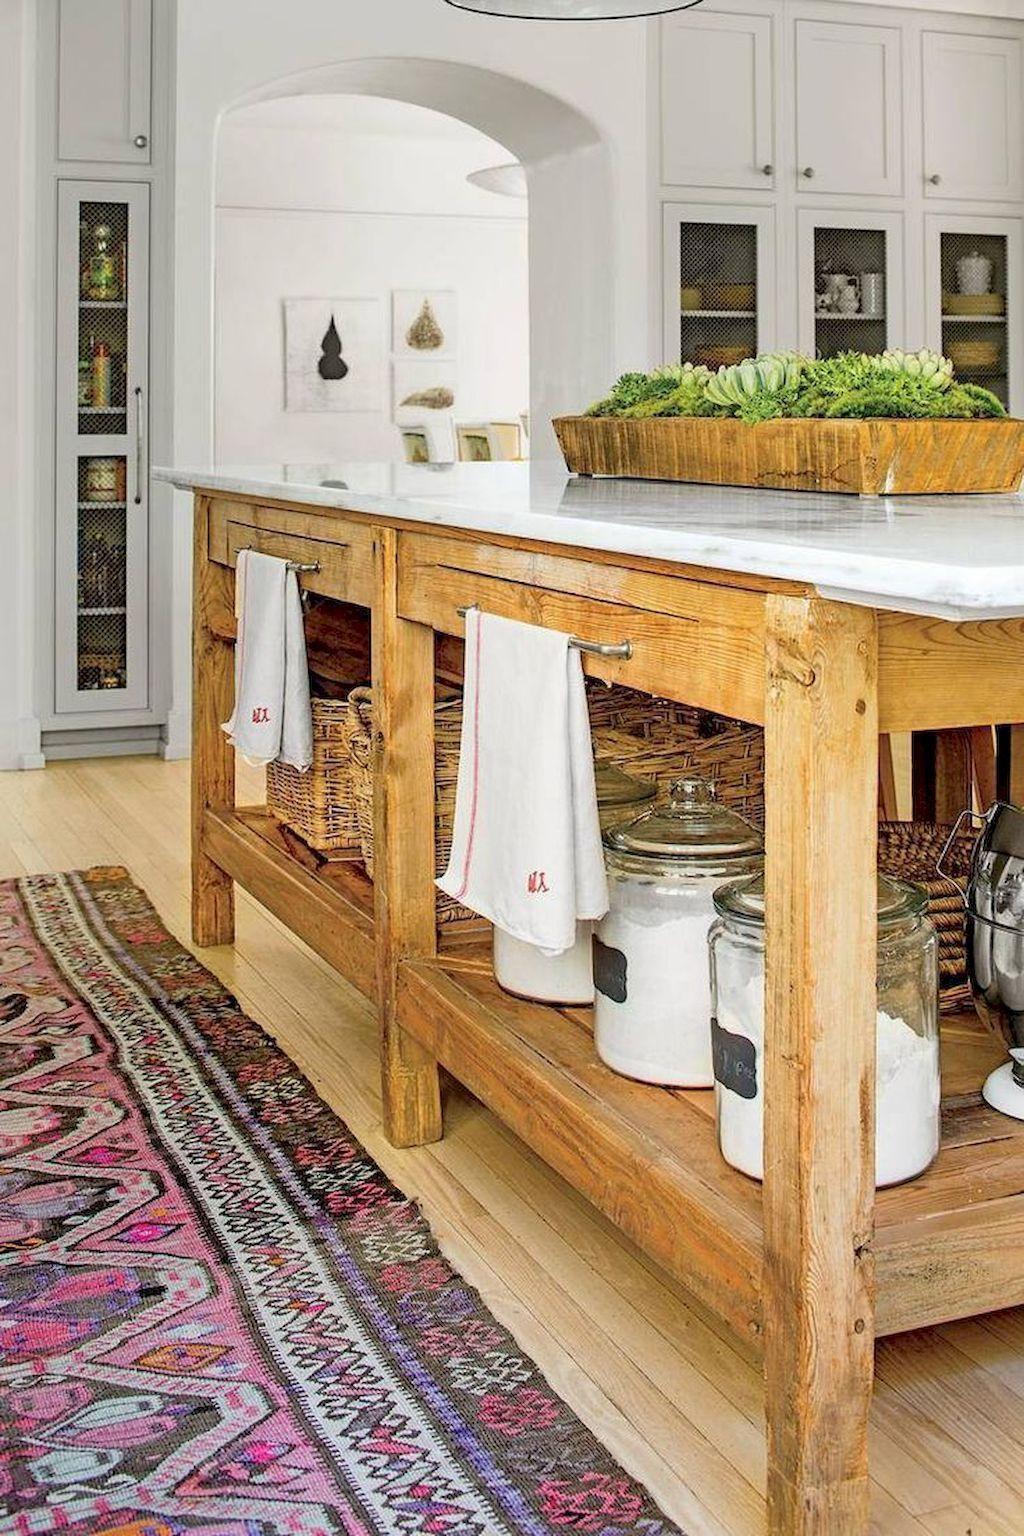 Cool 46 Fascinating Kitchen Bars Design Ideas Kitchen Like Real Bar.